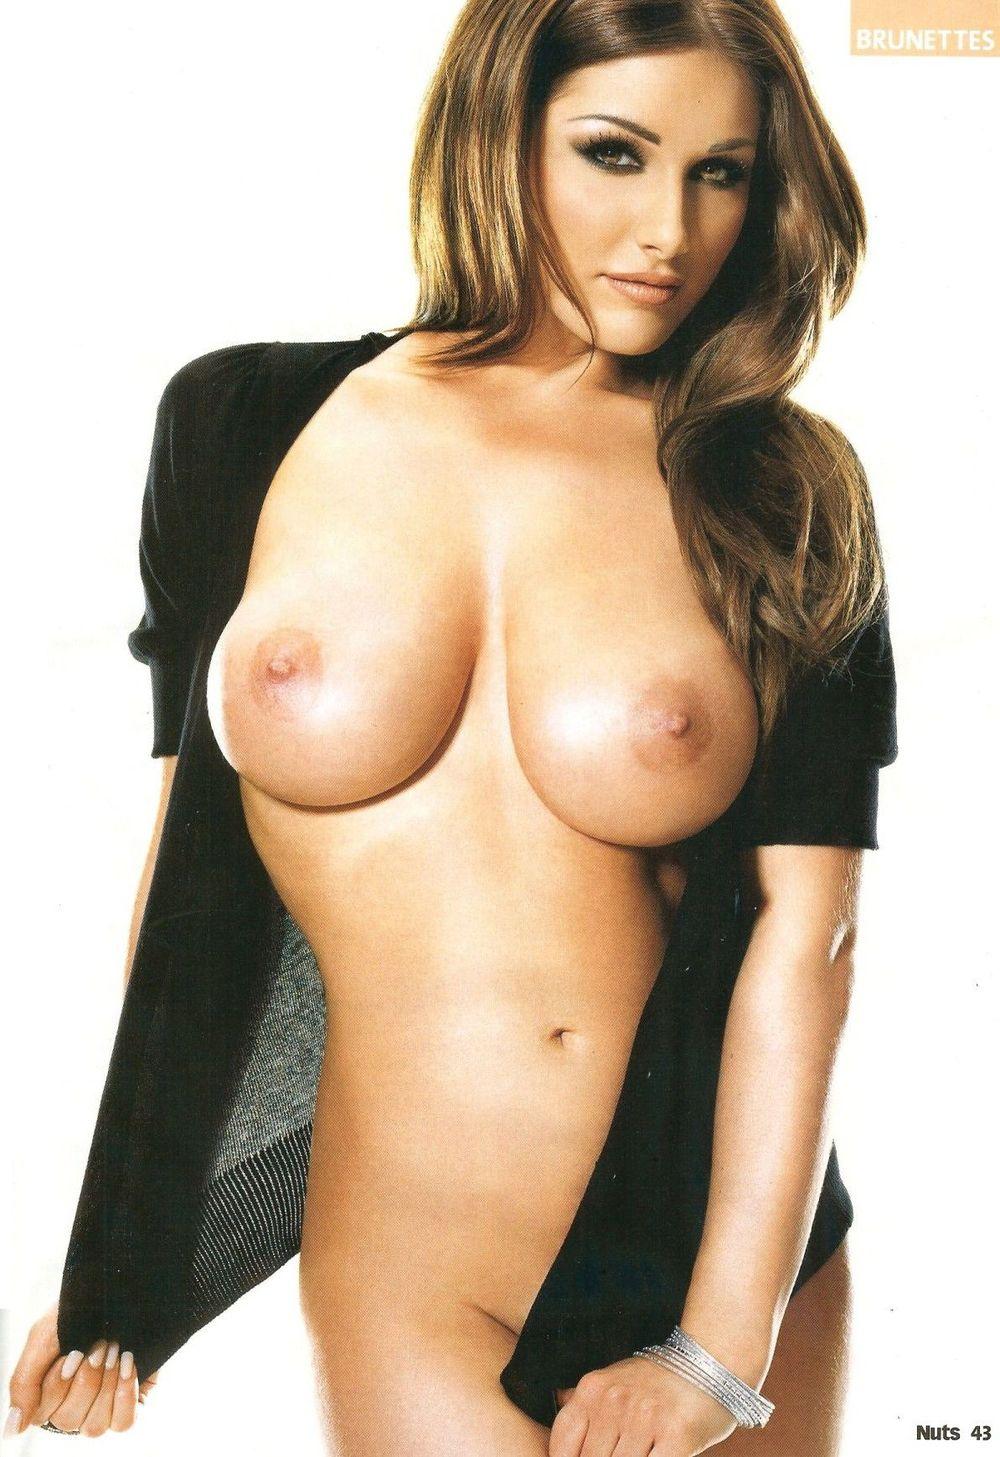 lucy-pinder-nude-nuts-02.jpg